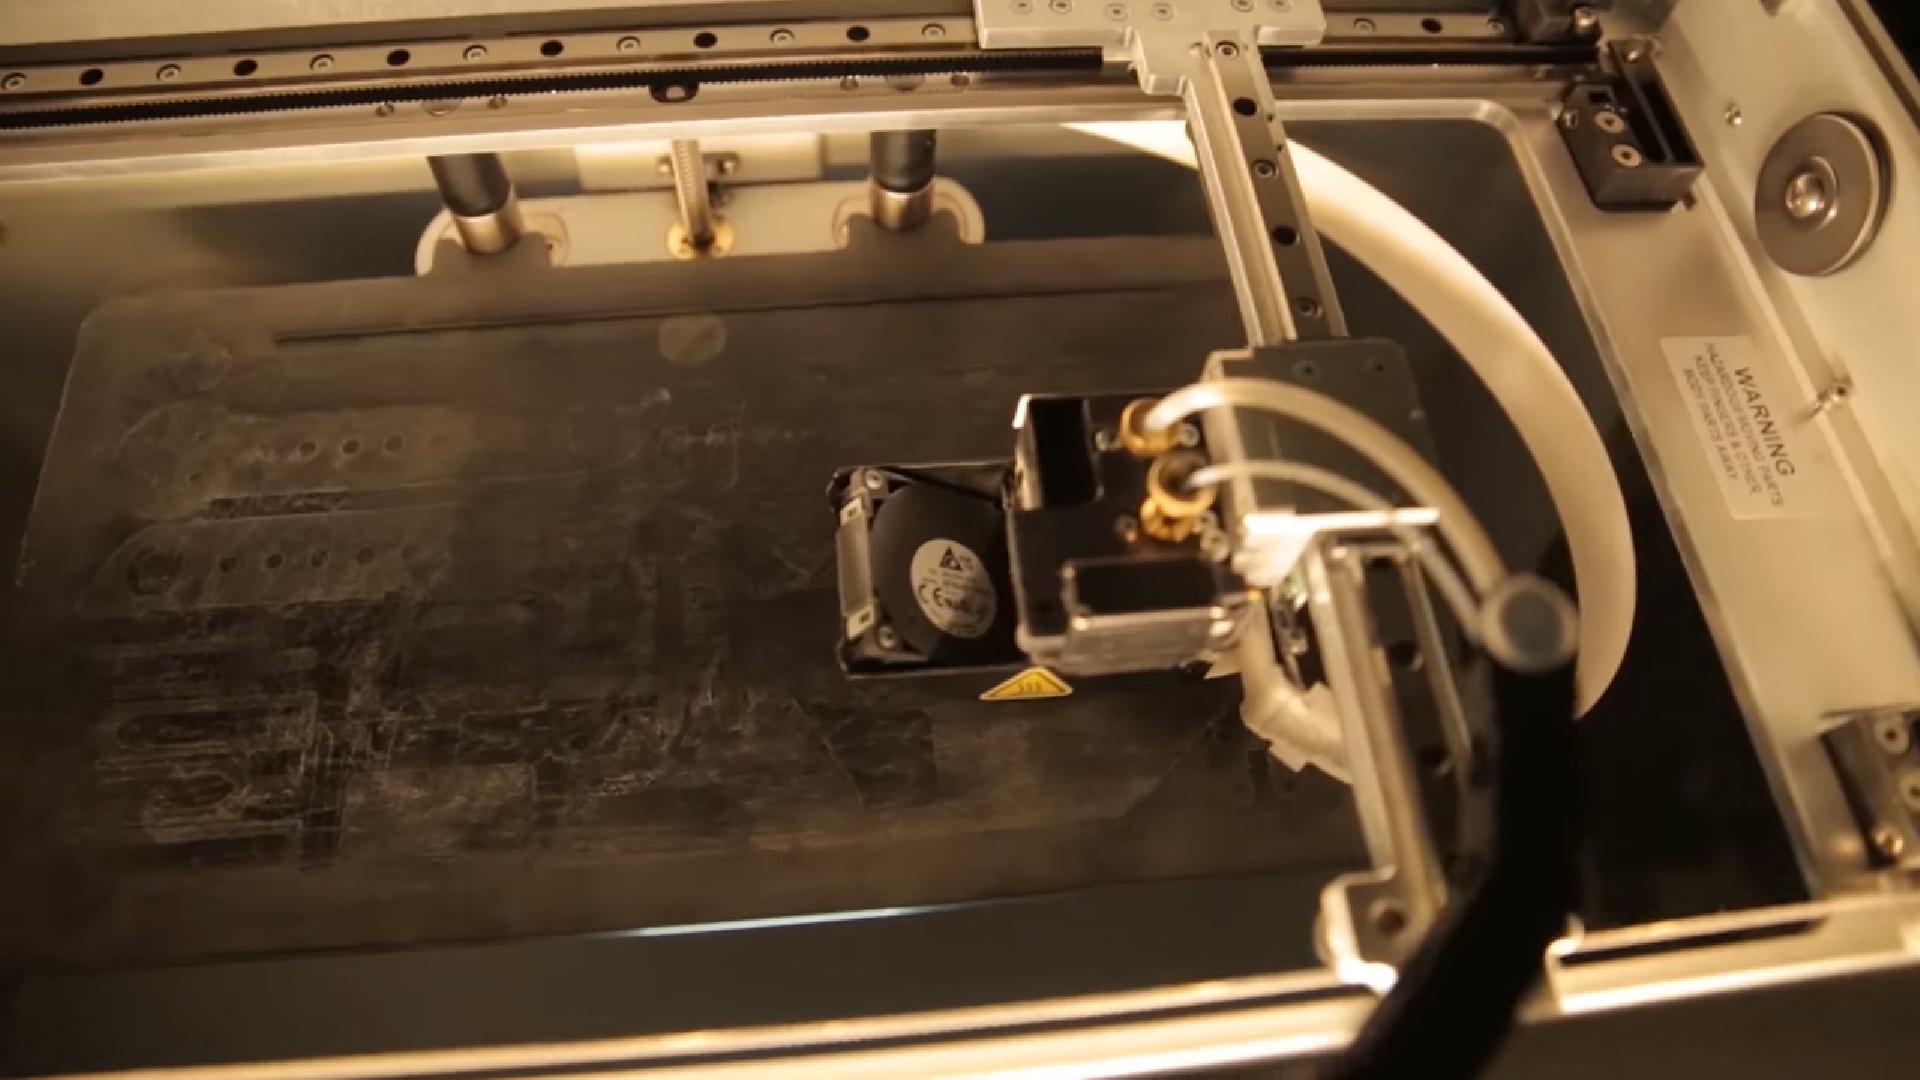 3d gedruckter sprengstoff us marines2 - Neue US-Marines Initiative testet 3D-gedruckten Sprengstoff